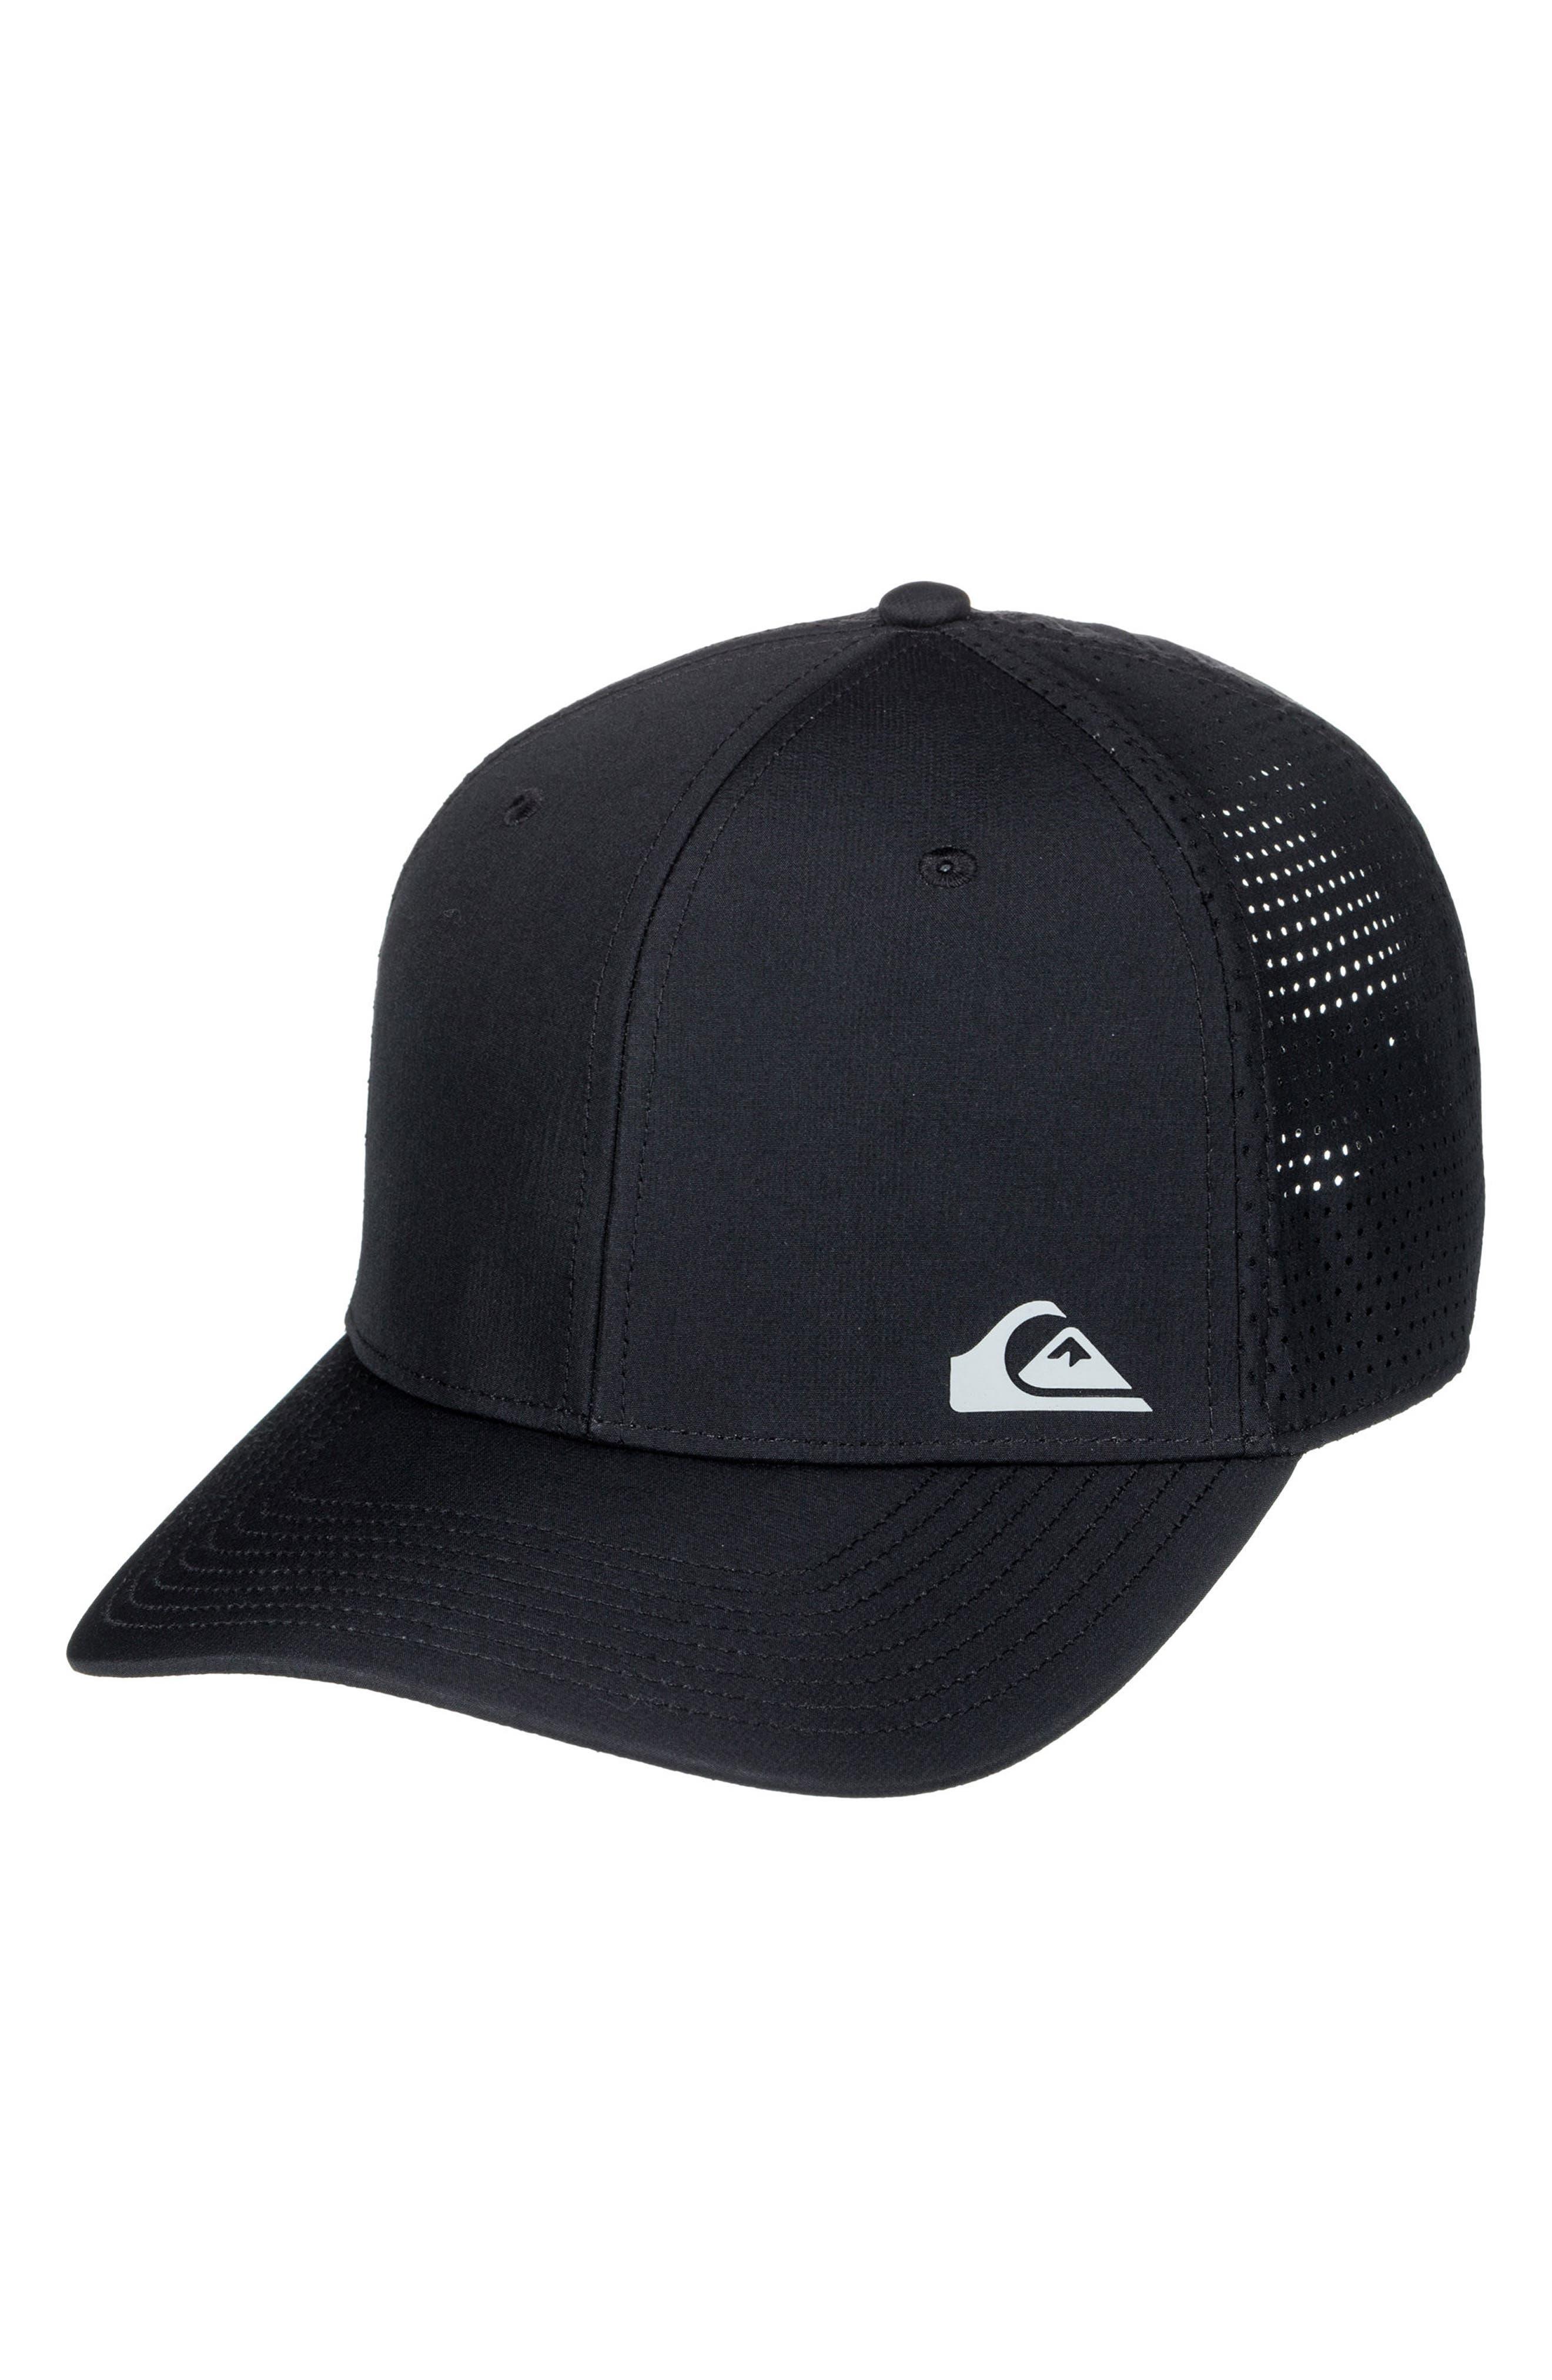 Technabutter Baseball Cap,                         Main,                         color, Black